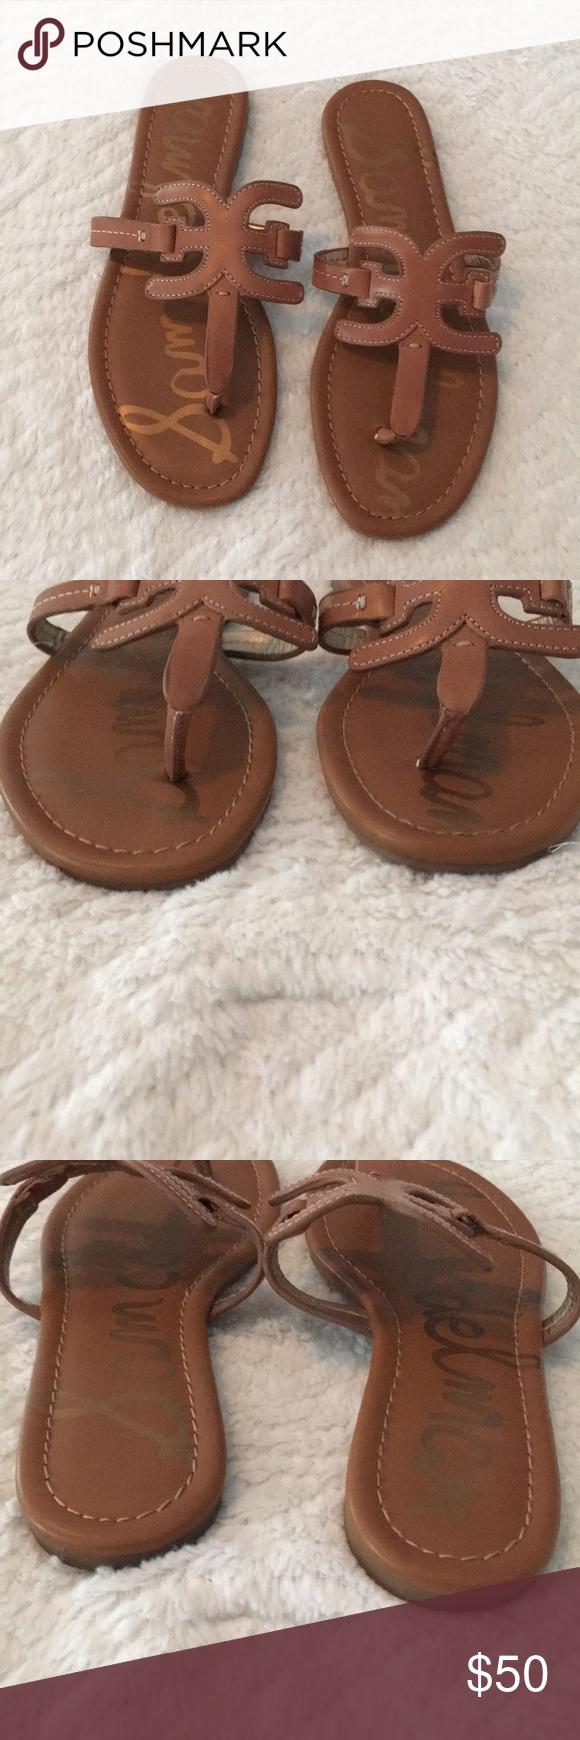 Sam Edelman Carter Tan Sandals Tan Sandals Diy Sandals Brown Leather Sandals